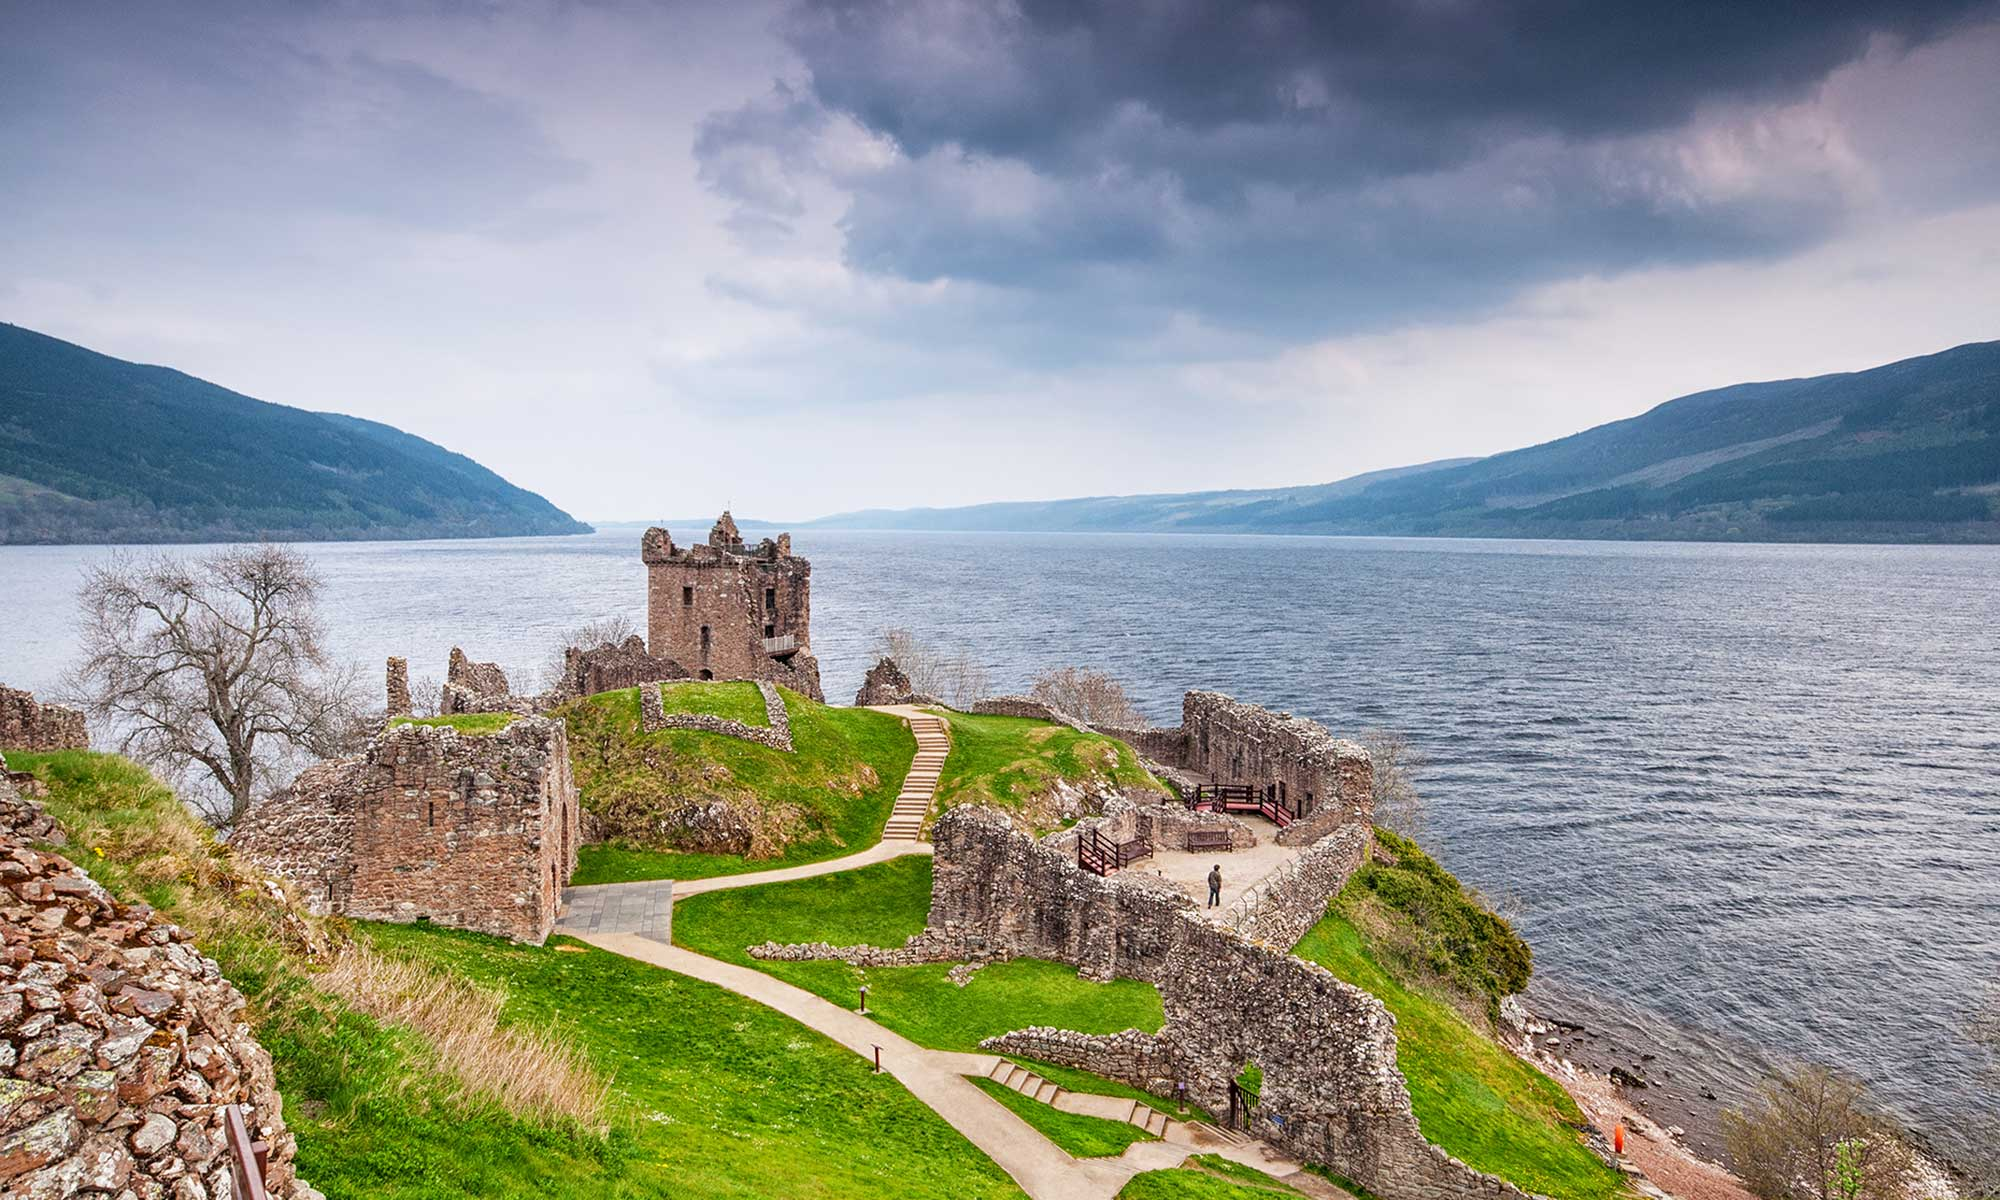 Loch Ness (Image: Botond Horvath/Shutterstock)